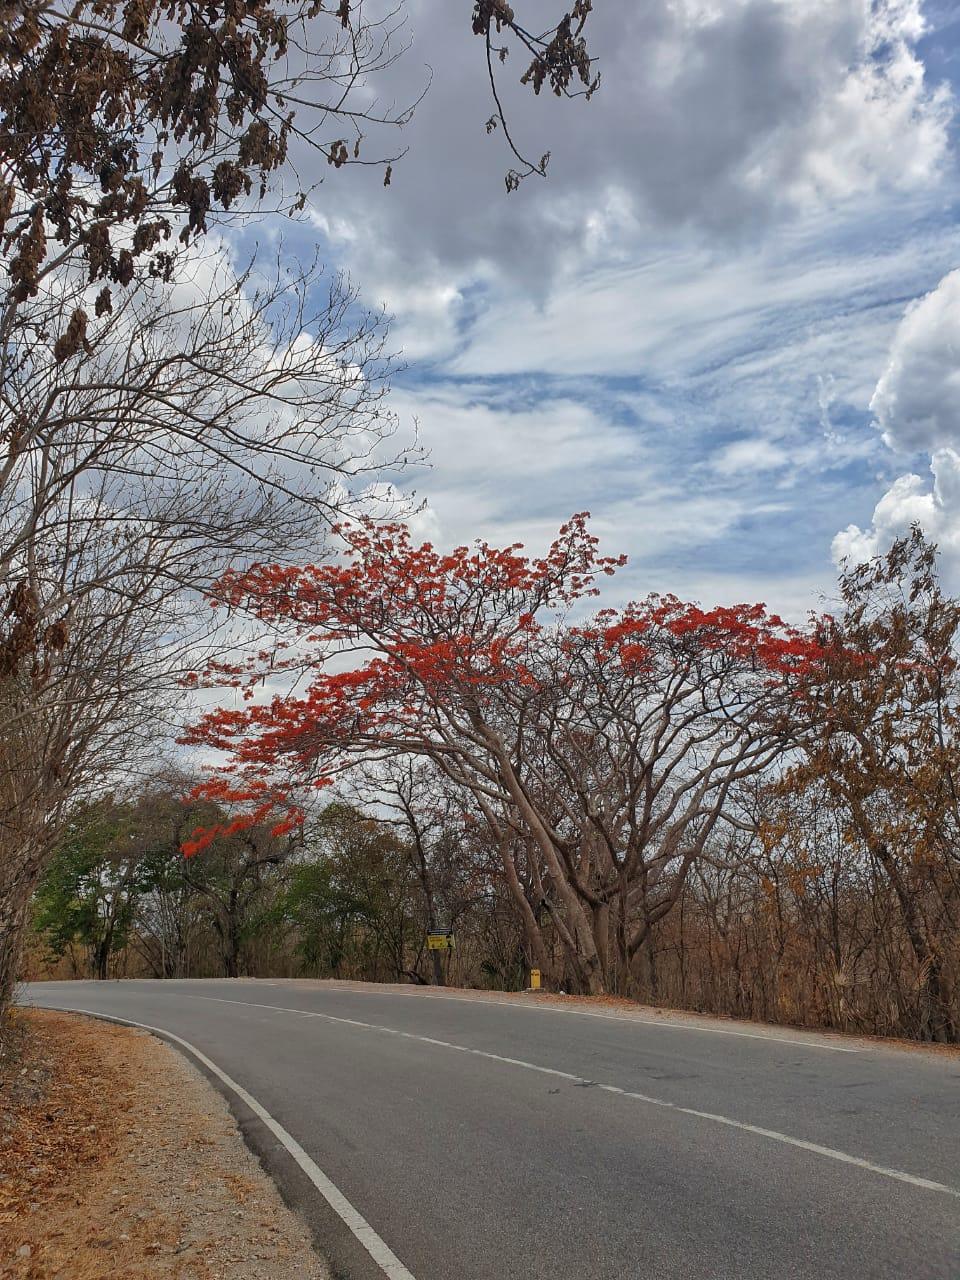 Sepe Flowers in Kupang City Blooms Beautifully in December